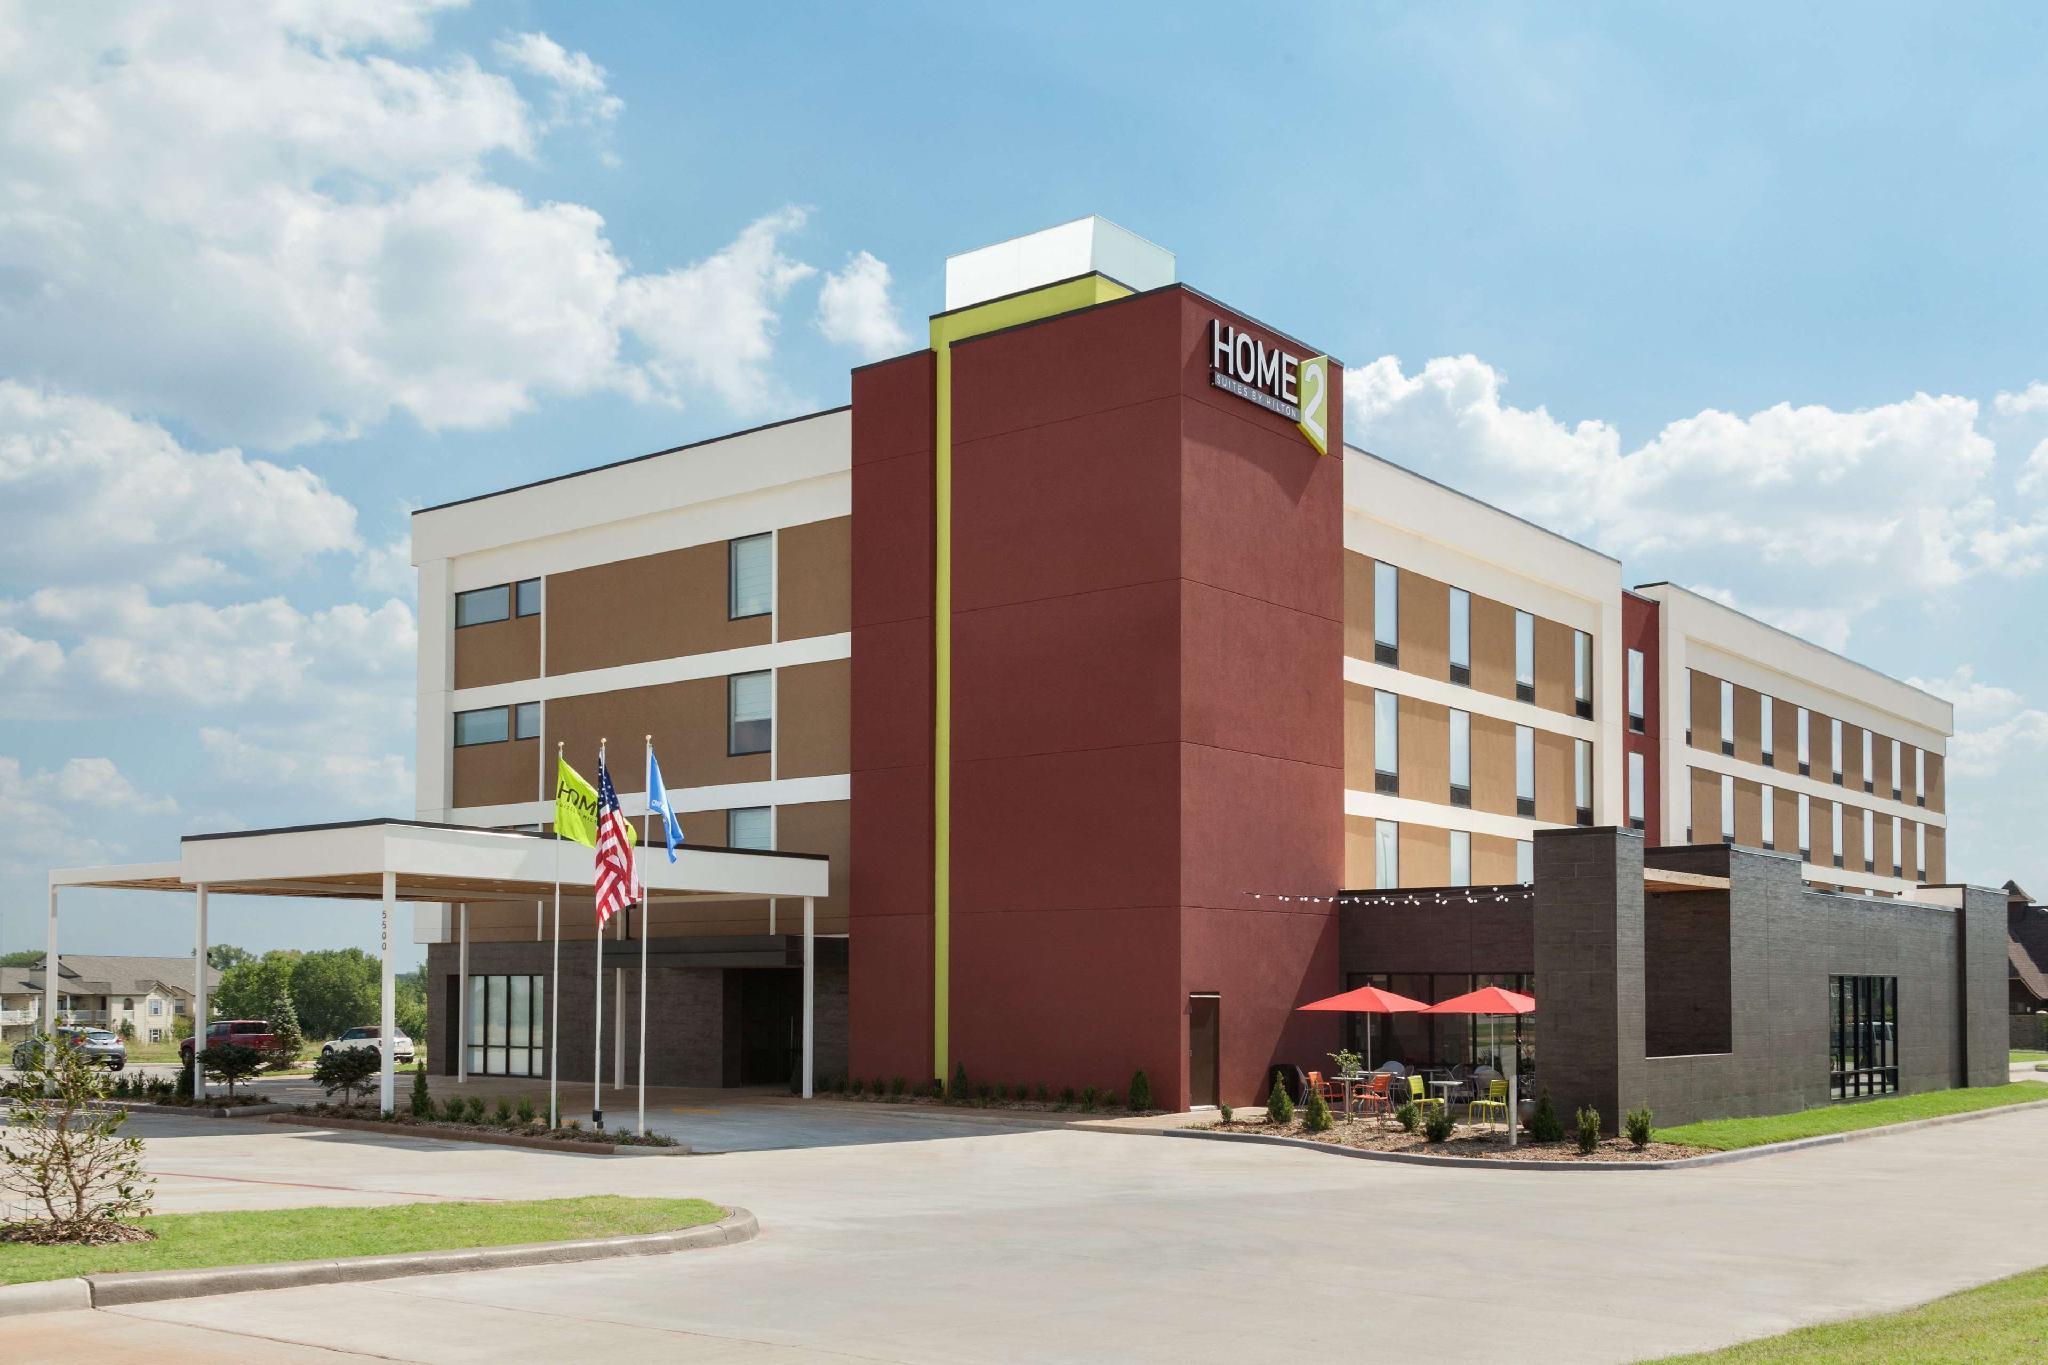 Home2 Suites by Hilton Oklahoma City Quail Springs, Oklahoma